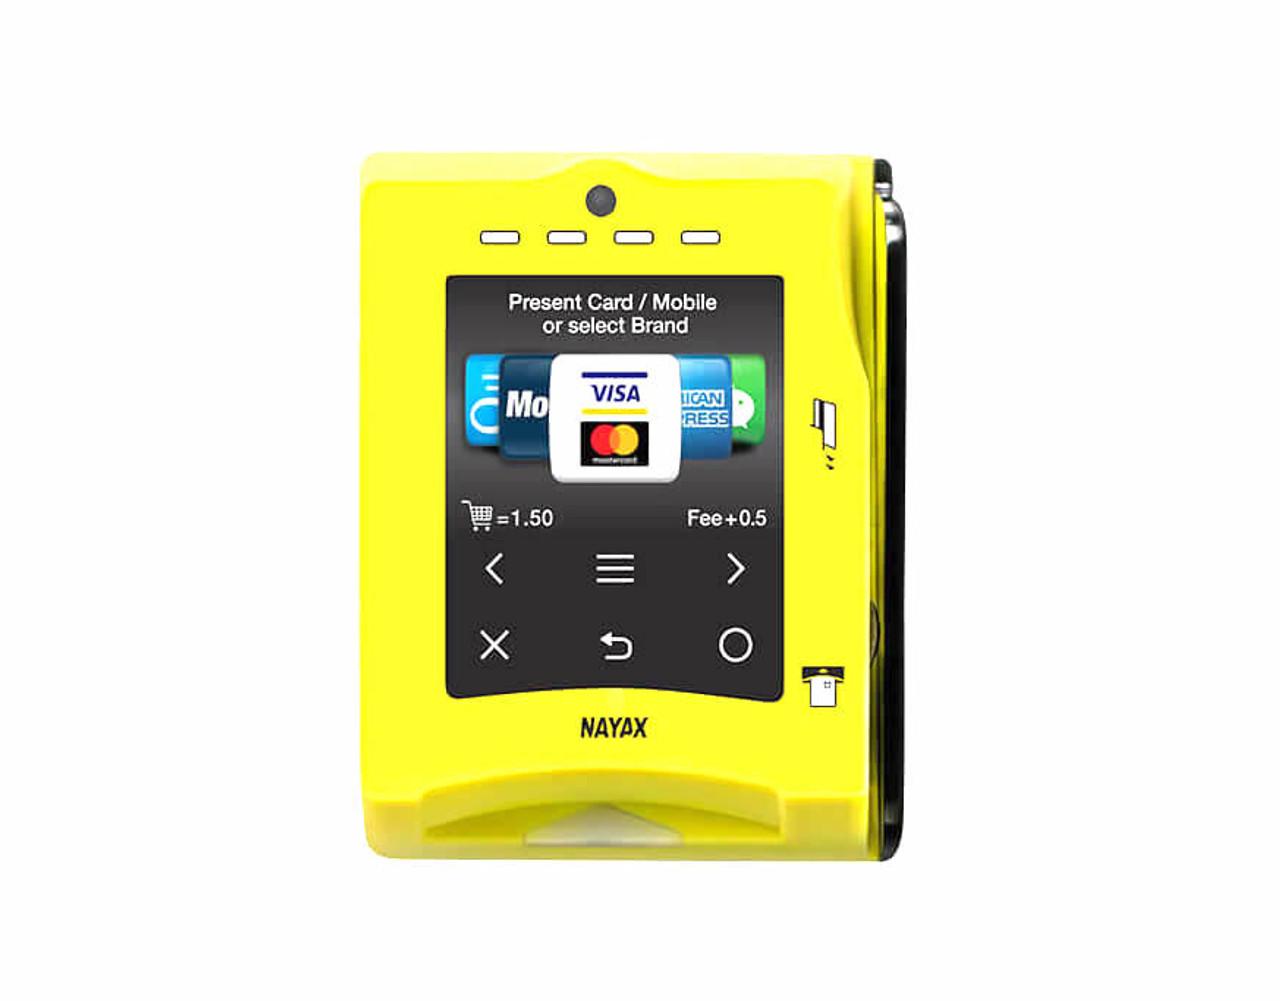 New Nayax VPOS Touch Credit Card Reader